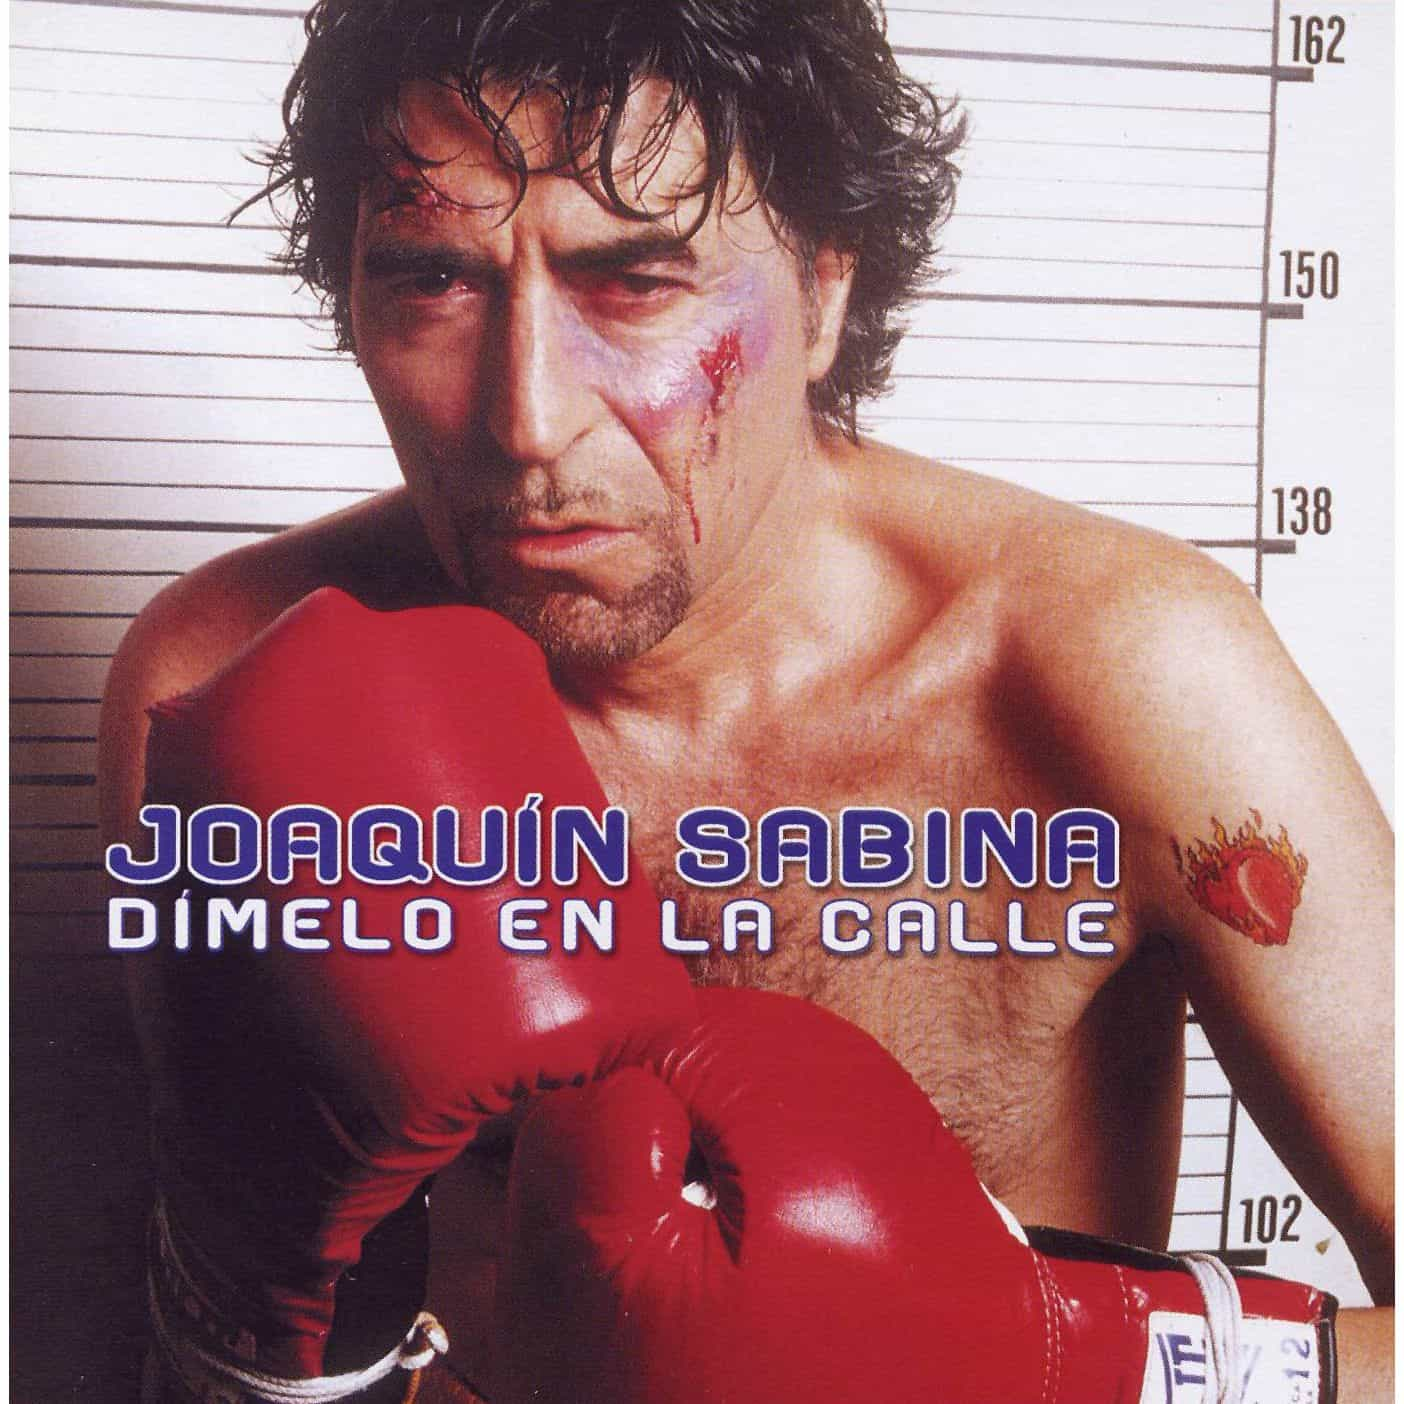 Dimelo-En-La-Calle-cover